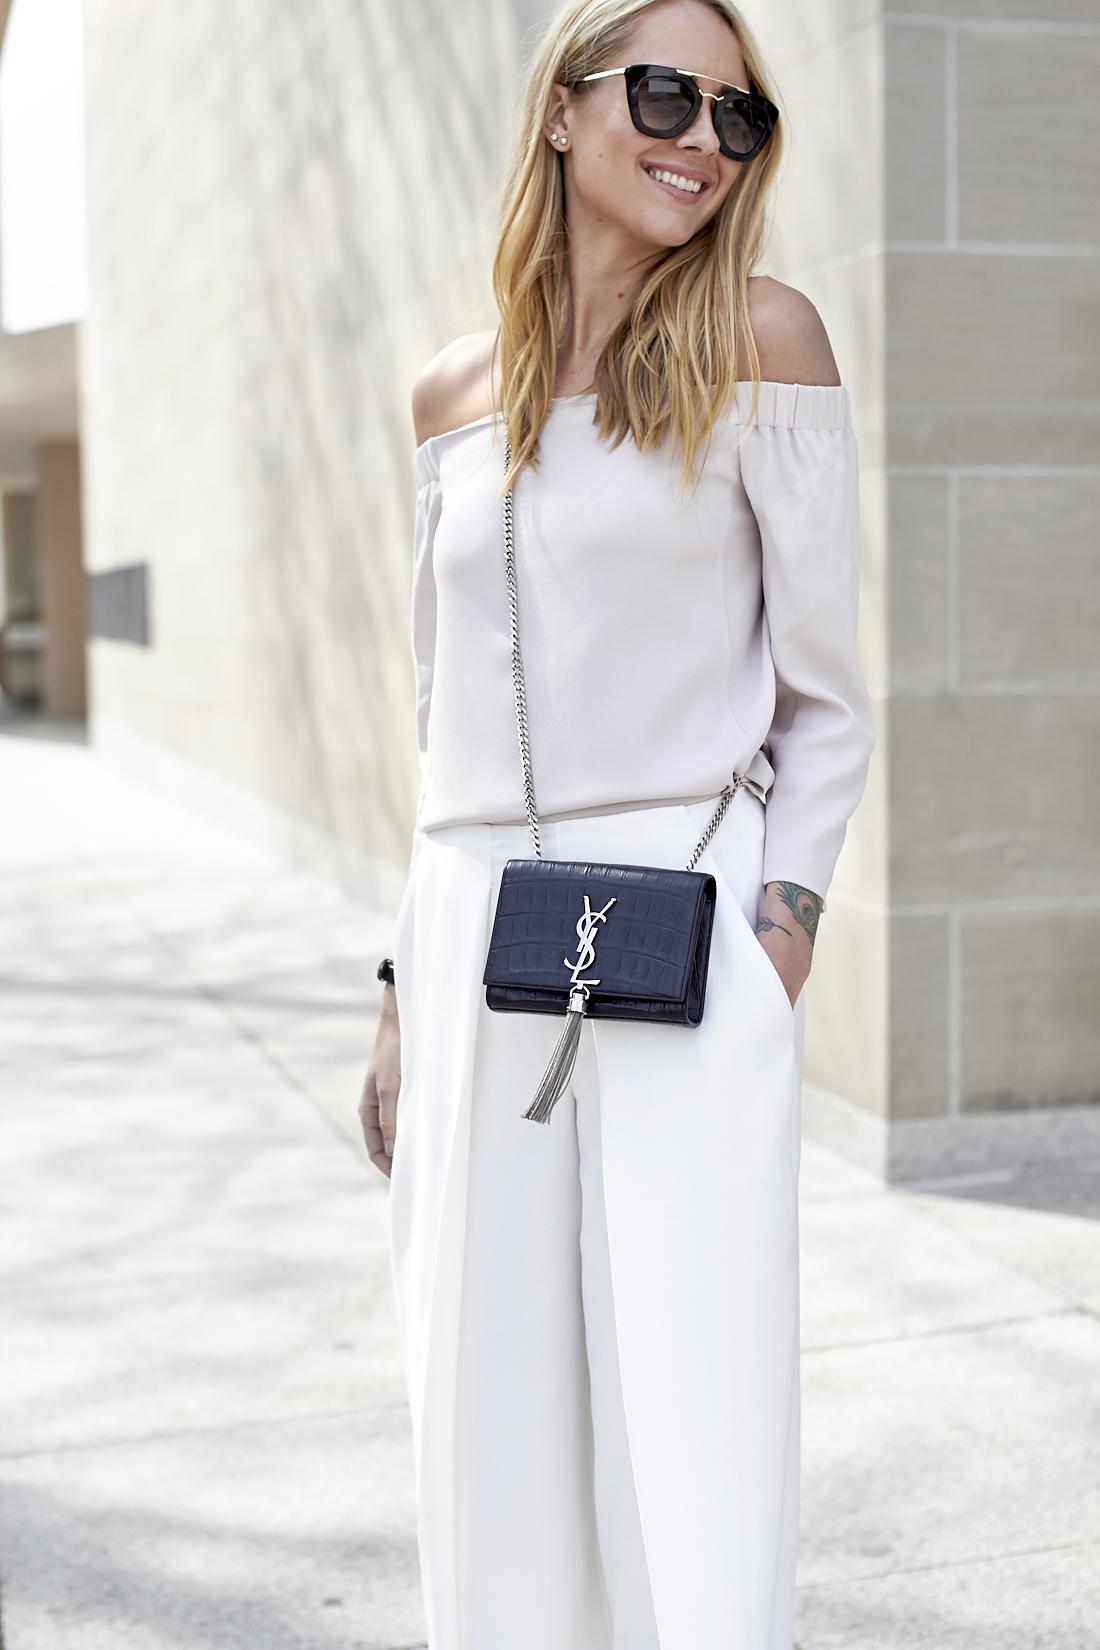 fashion-jackson-white-culottes-saint-laurent-monogram-crossbody-prada-retro-sunglasses-off-the-shoulder-top